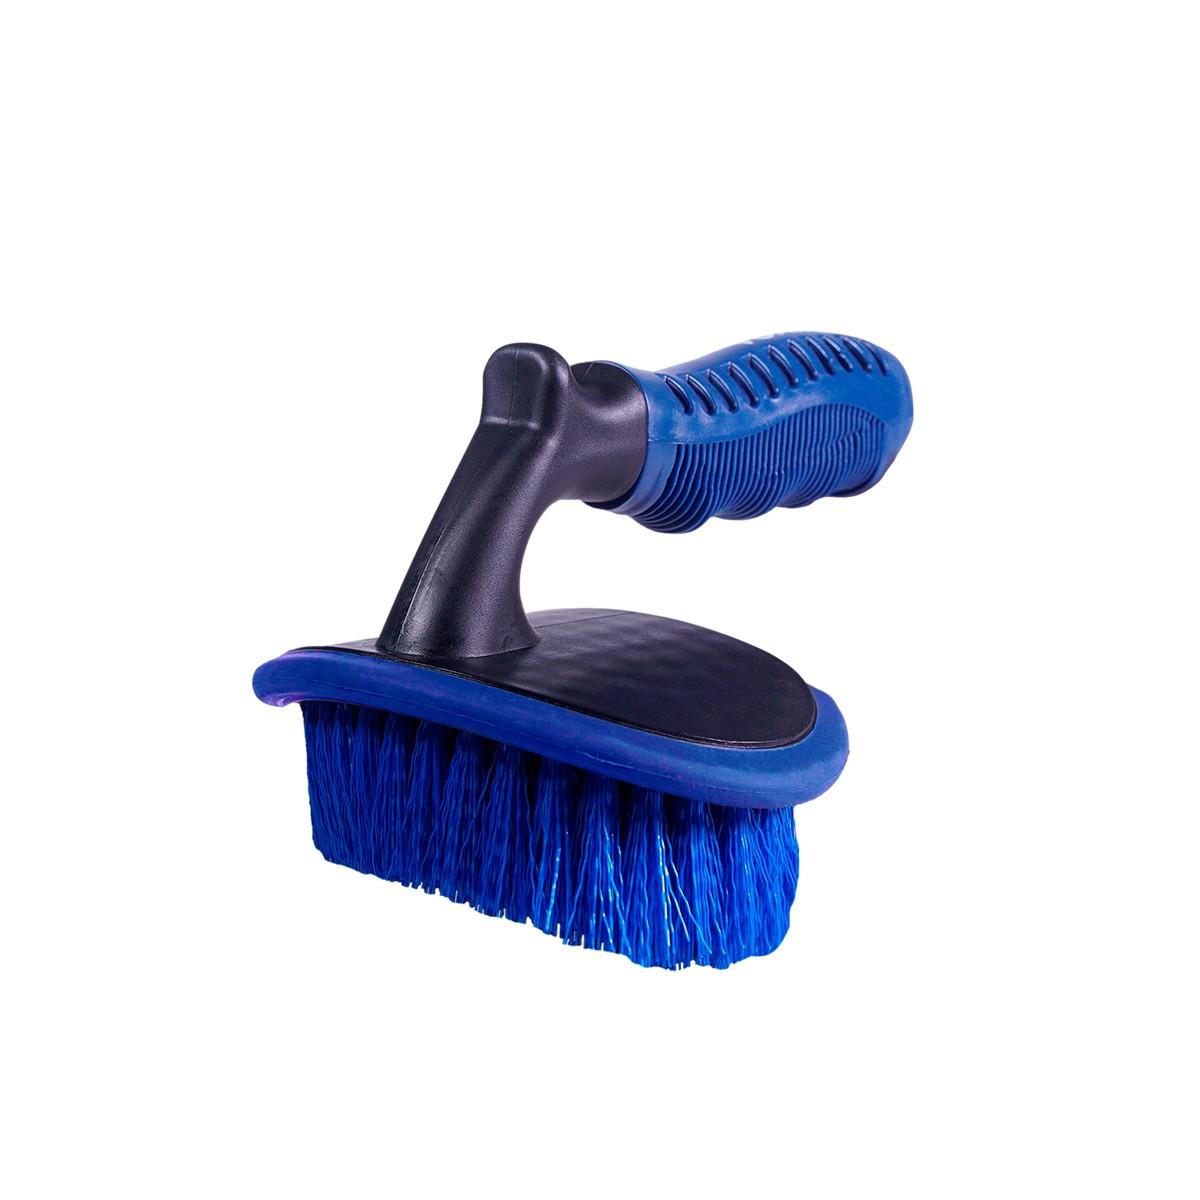 Escova Para Limpeza de Pneus - Vonixx